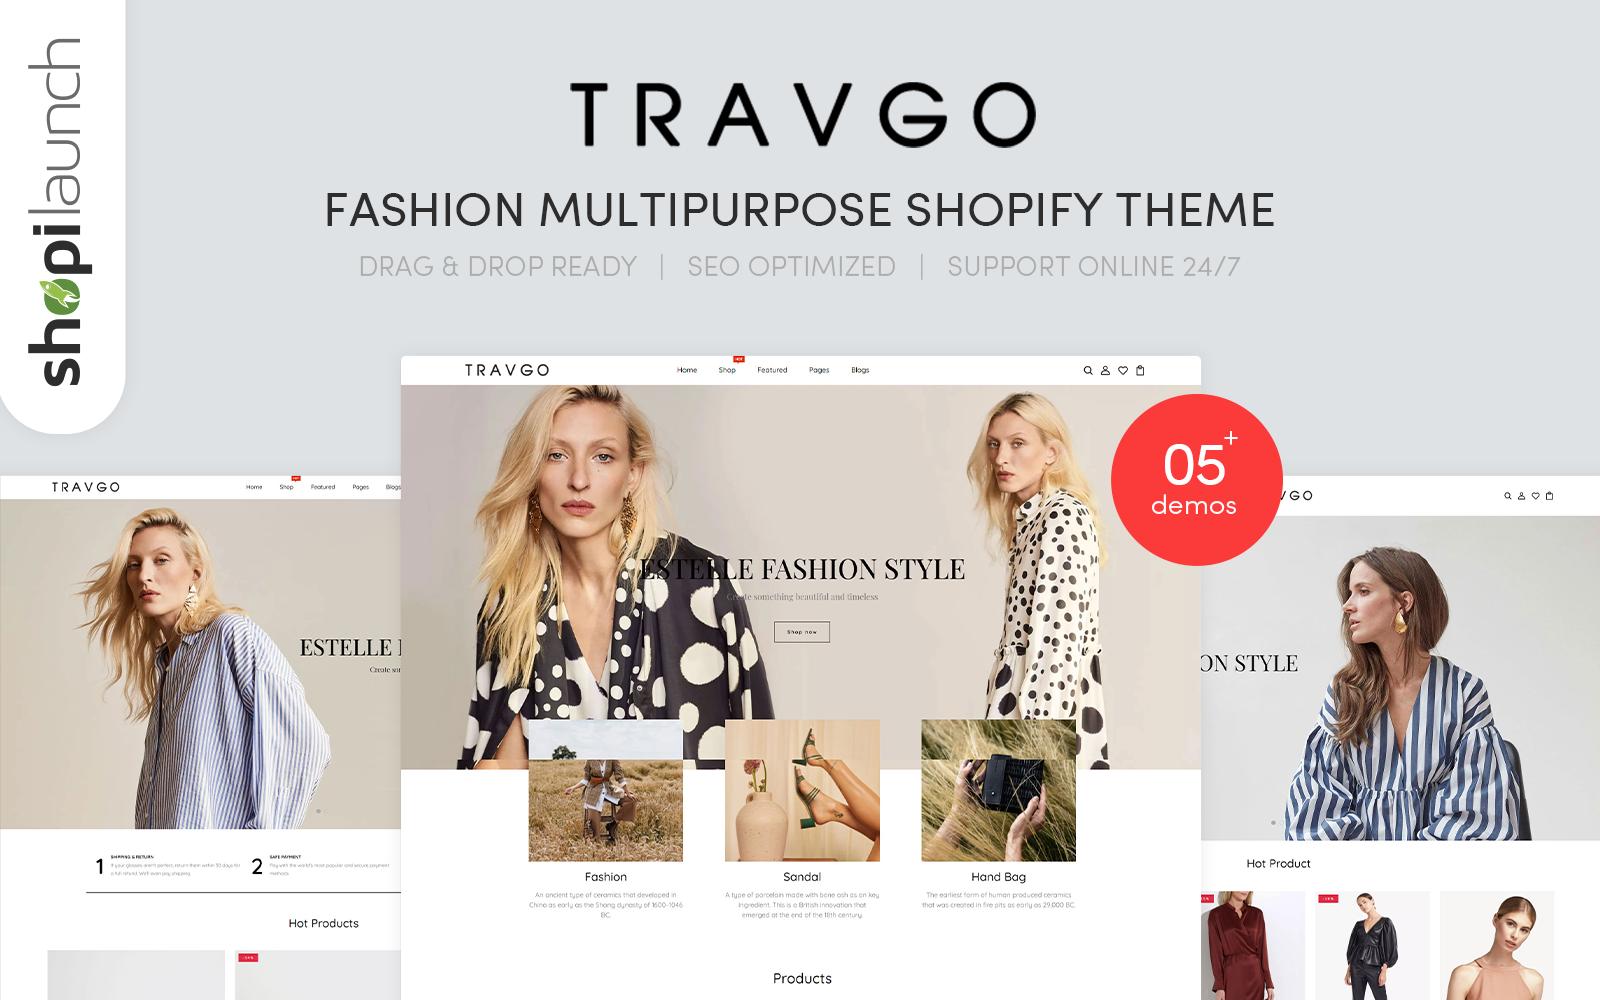 Travgo - Fashion Multipurpose Shopify Theme